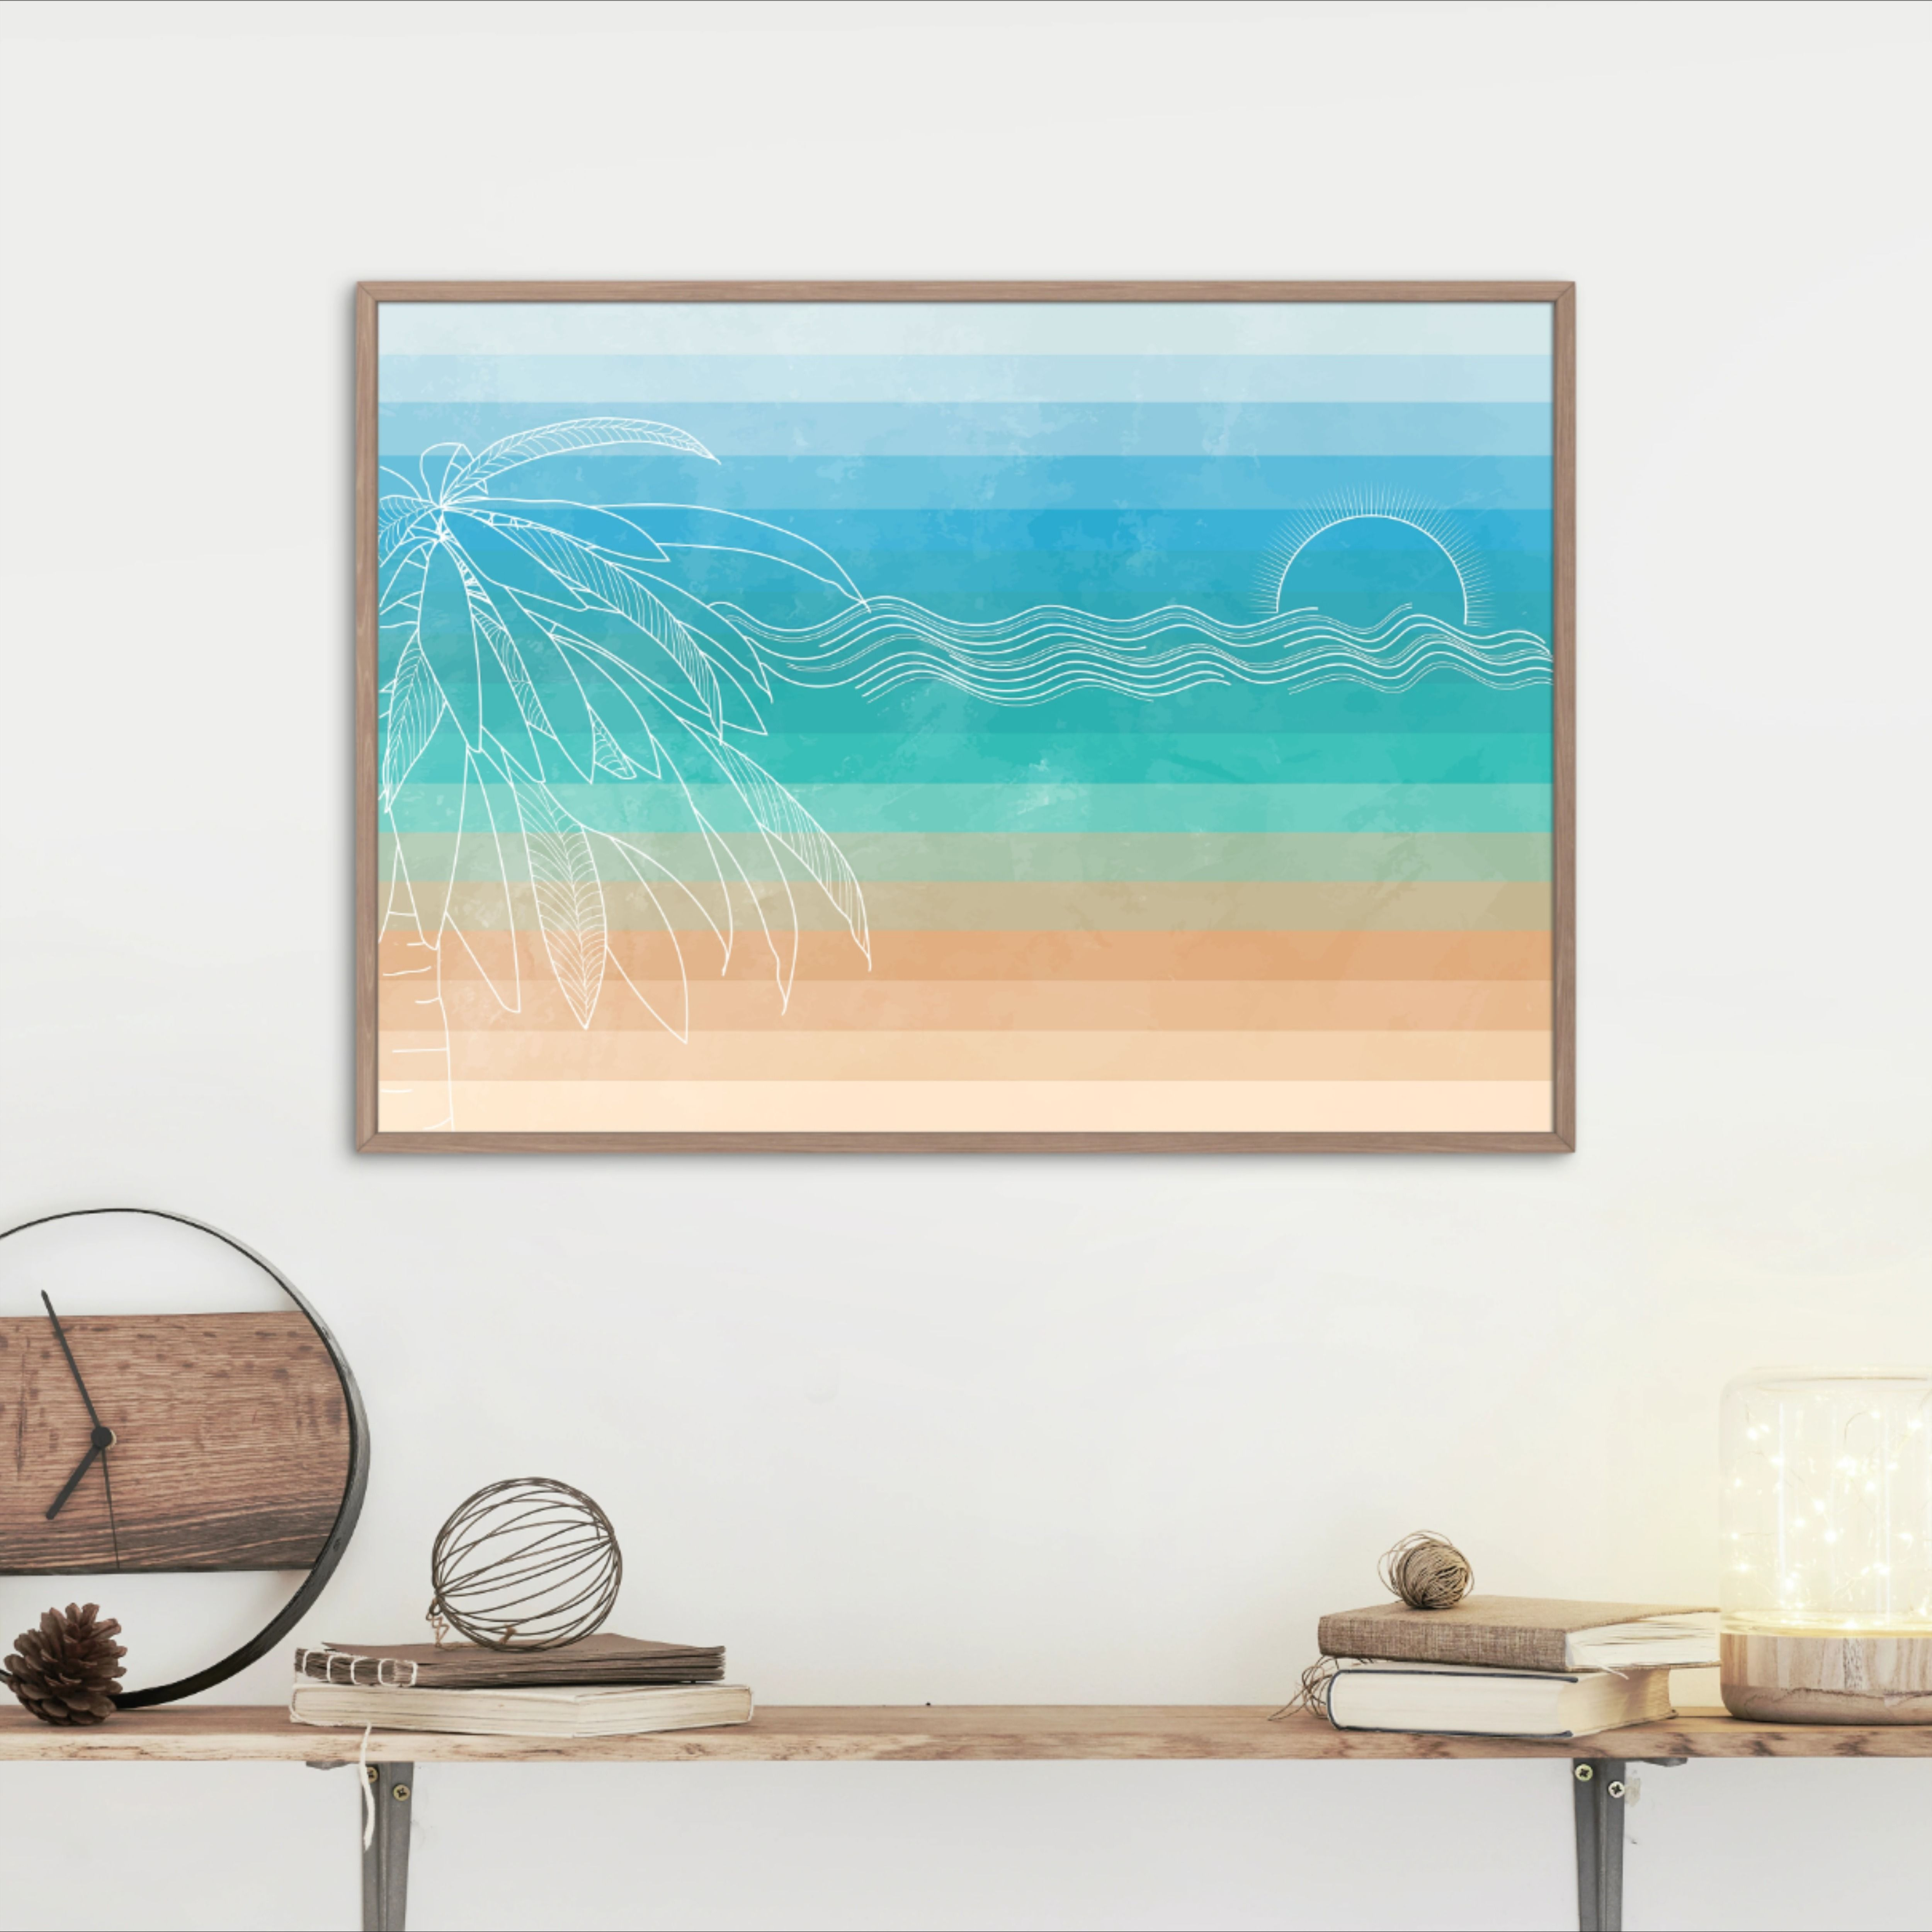 The Beach Abstract Digital Wall Art Digital Download Etsy Modern Printable Wall Art Digital Wall Art Art Gallery Wall